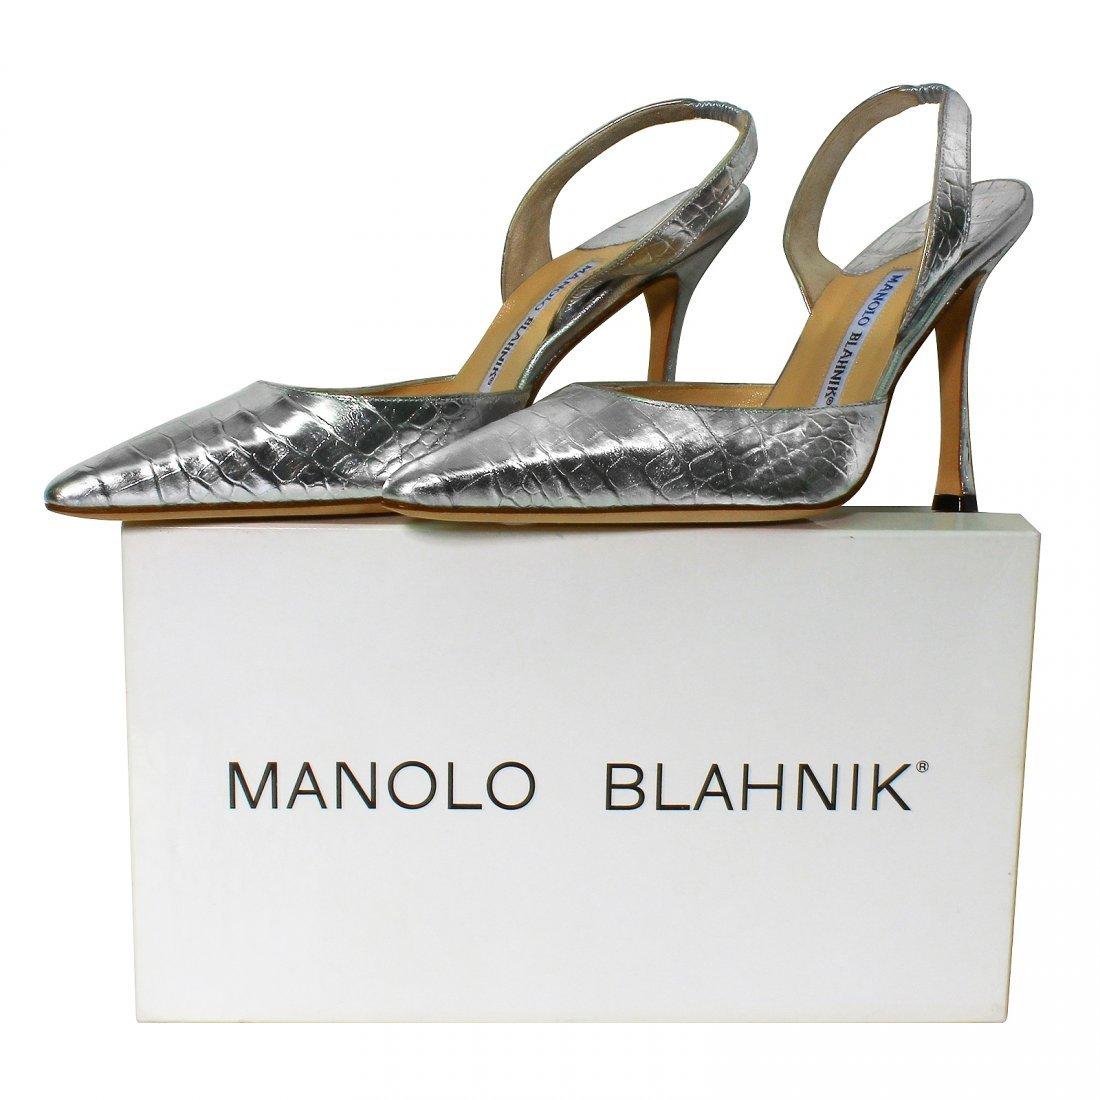 NEW Manolo Blahnik Shoes Silver Carolyne Crocodile - 4